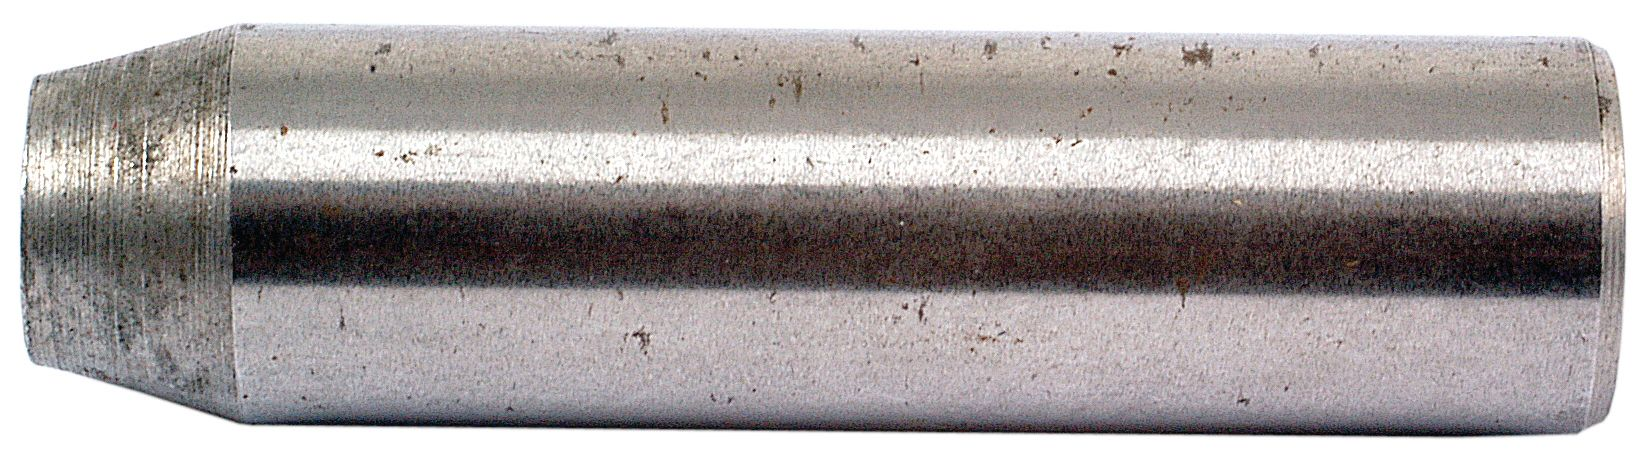 LANDINI PIN-HYDRAULIC DRAFT SUPPORT 42700